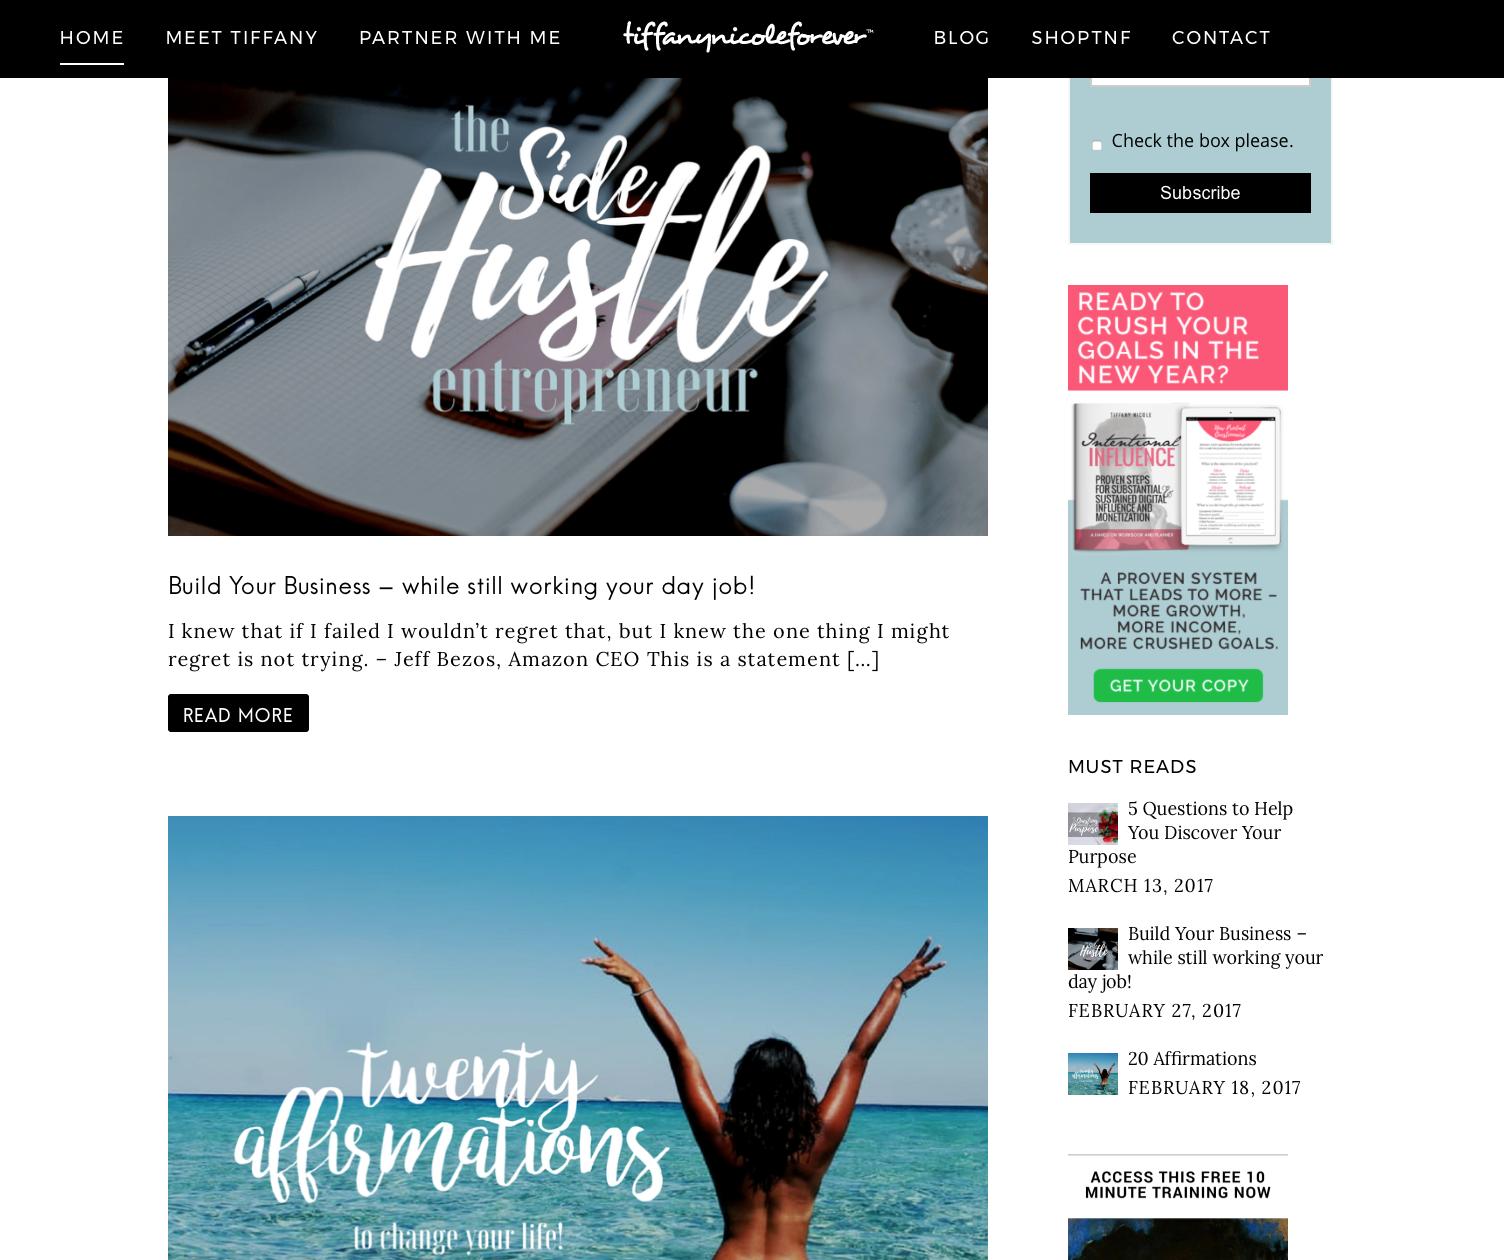 wordpress featured image ideas